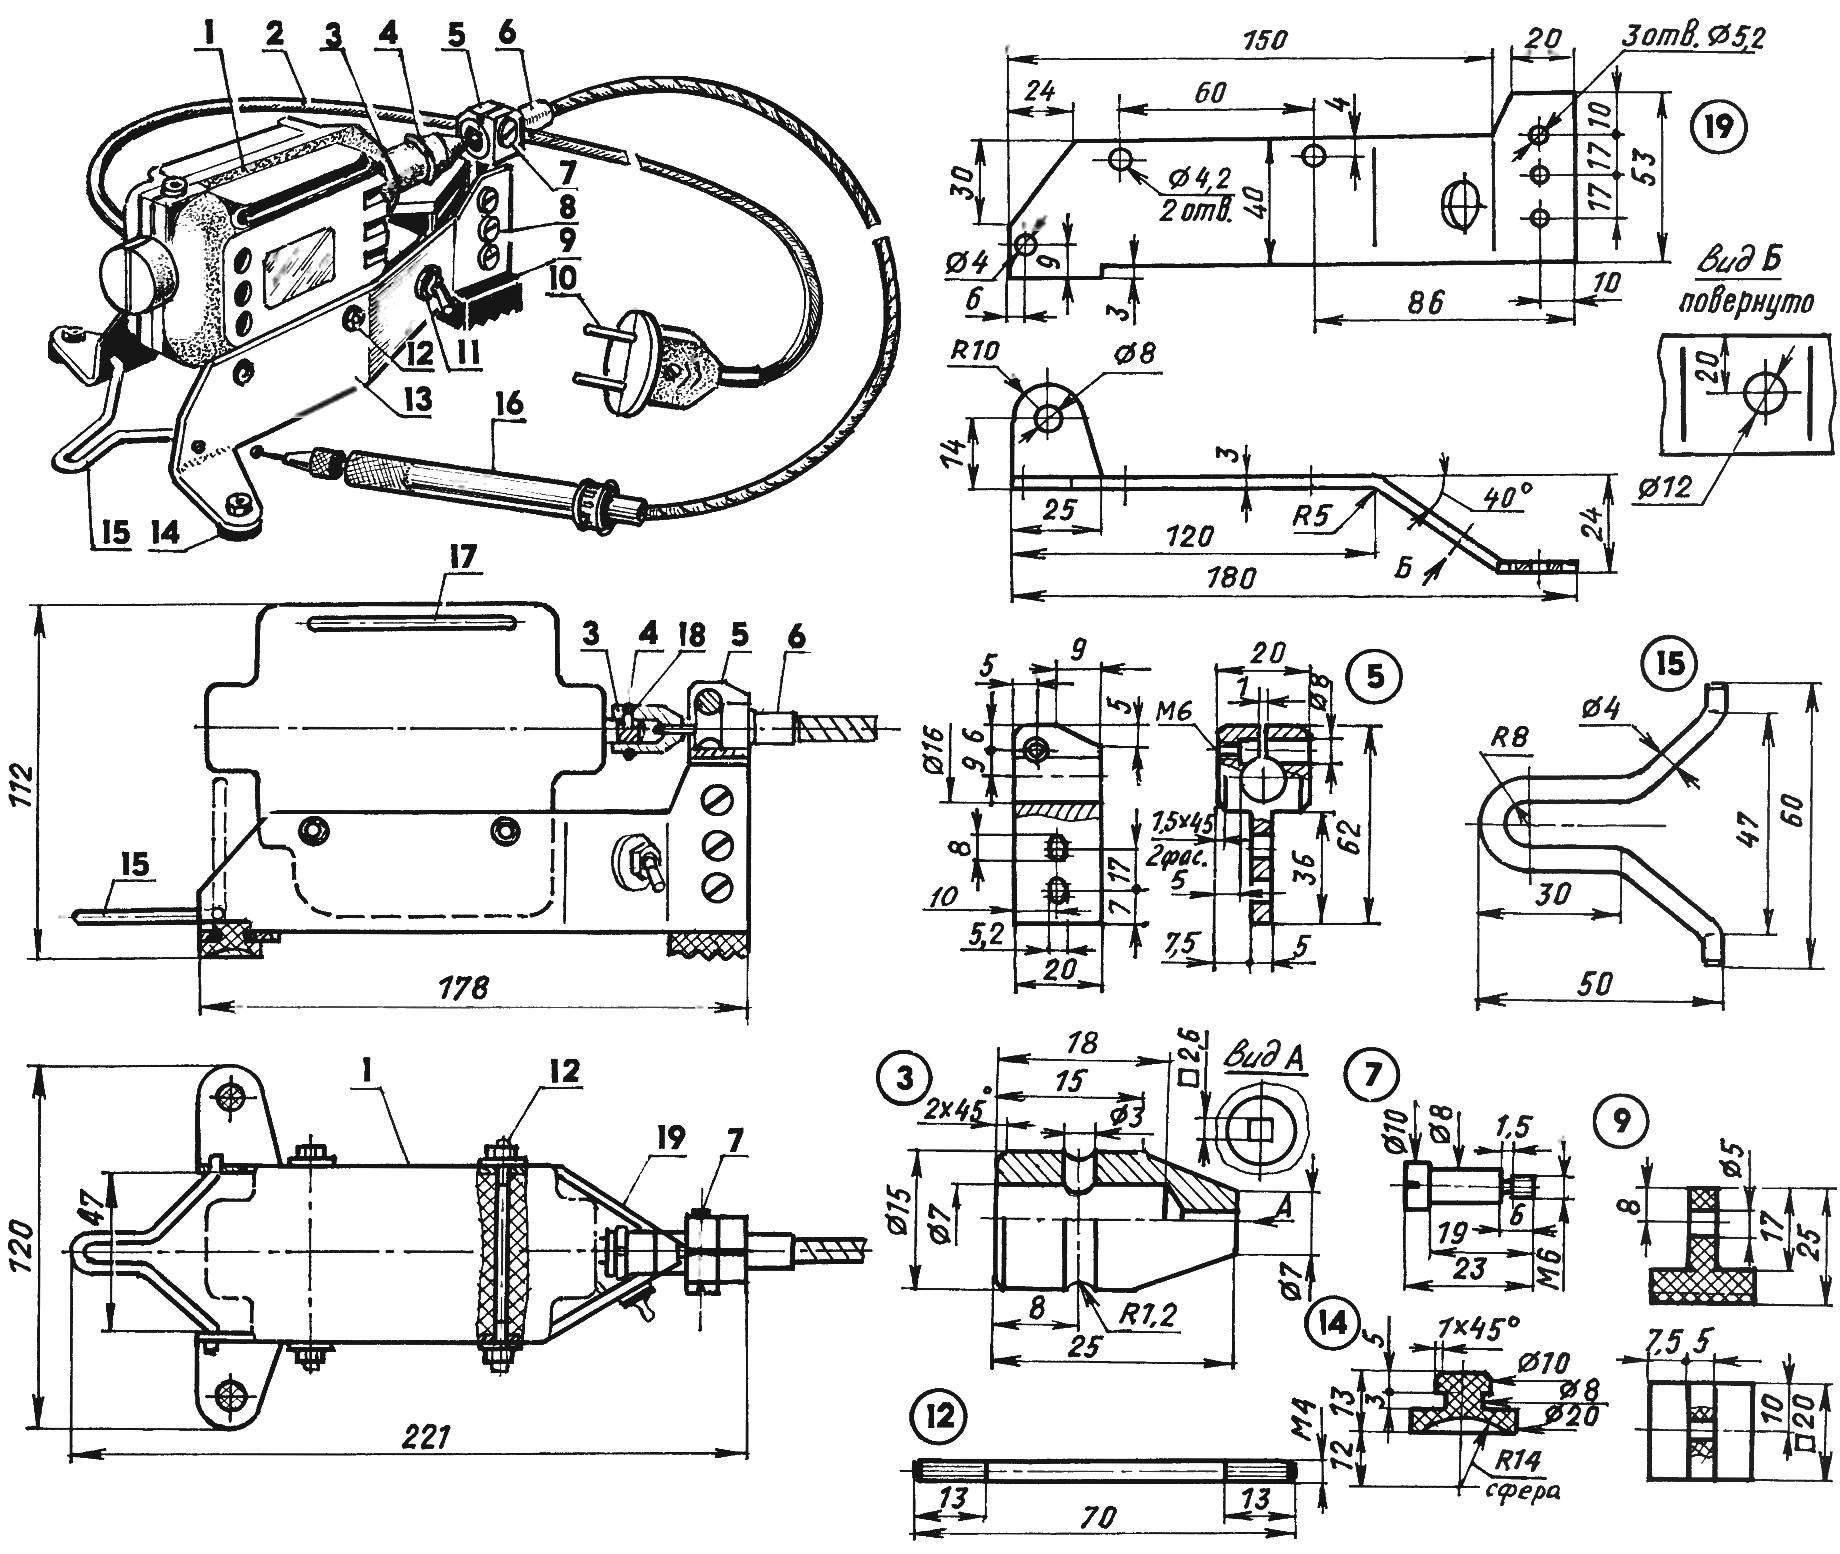 Fig. 1. Drill